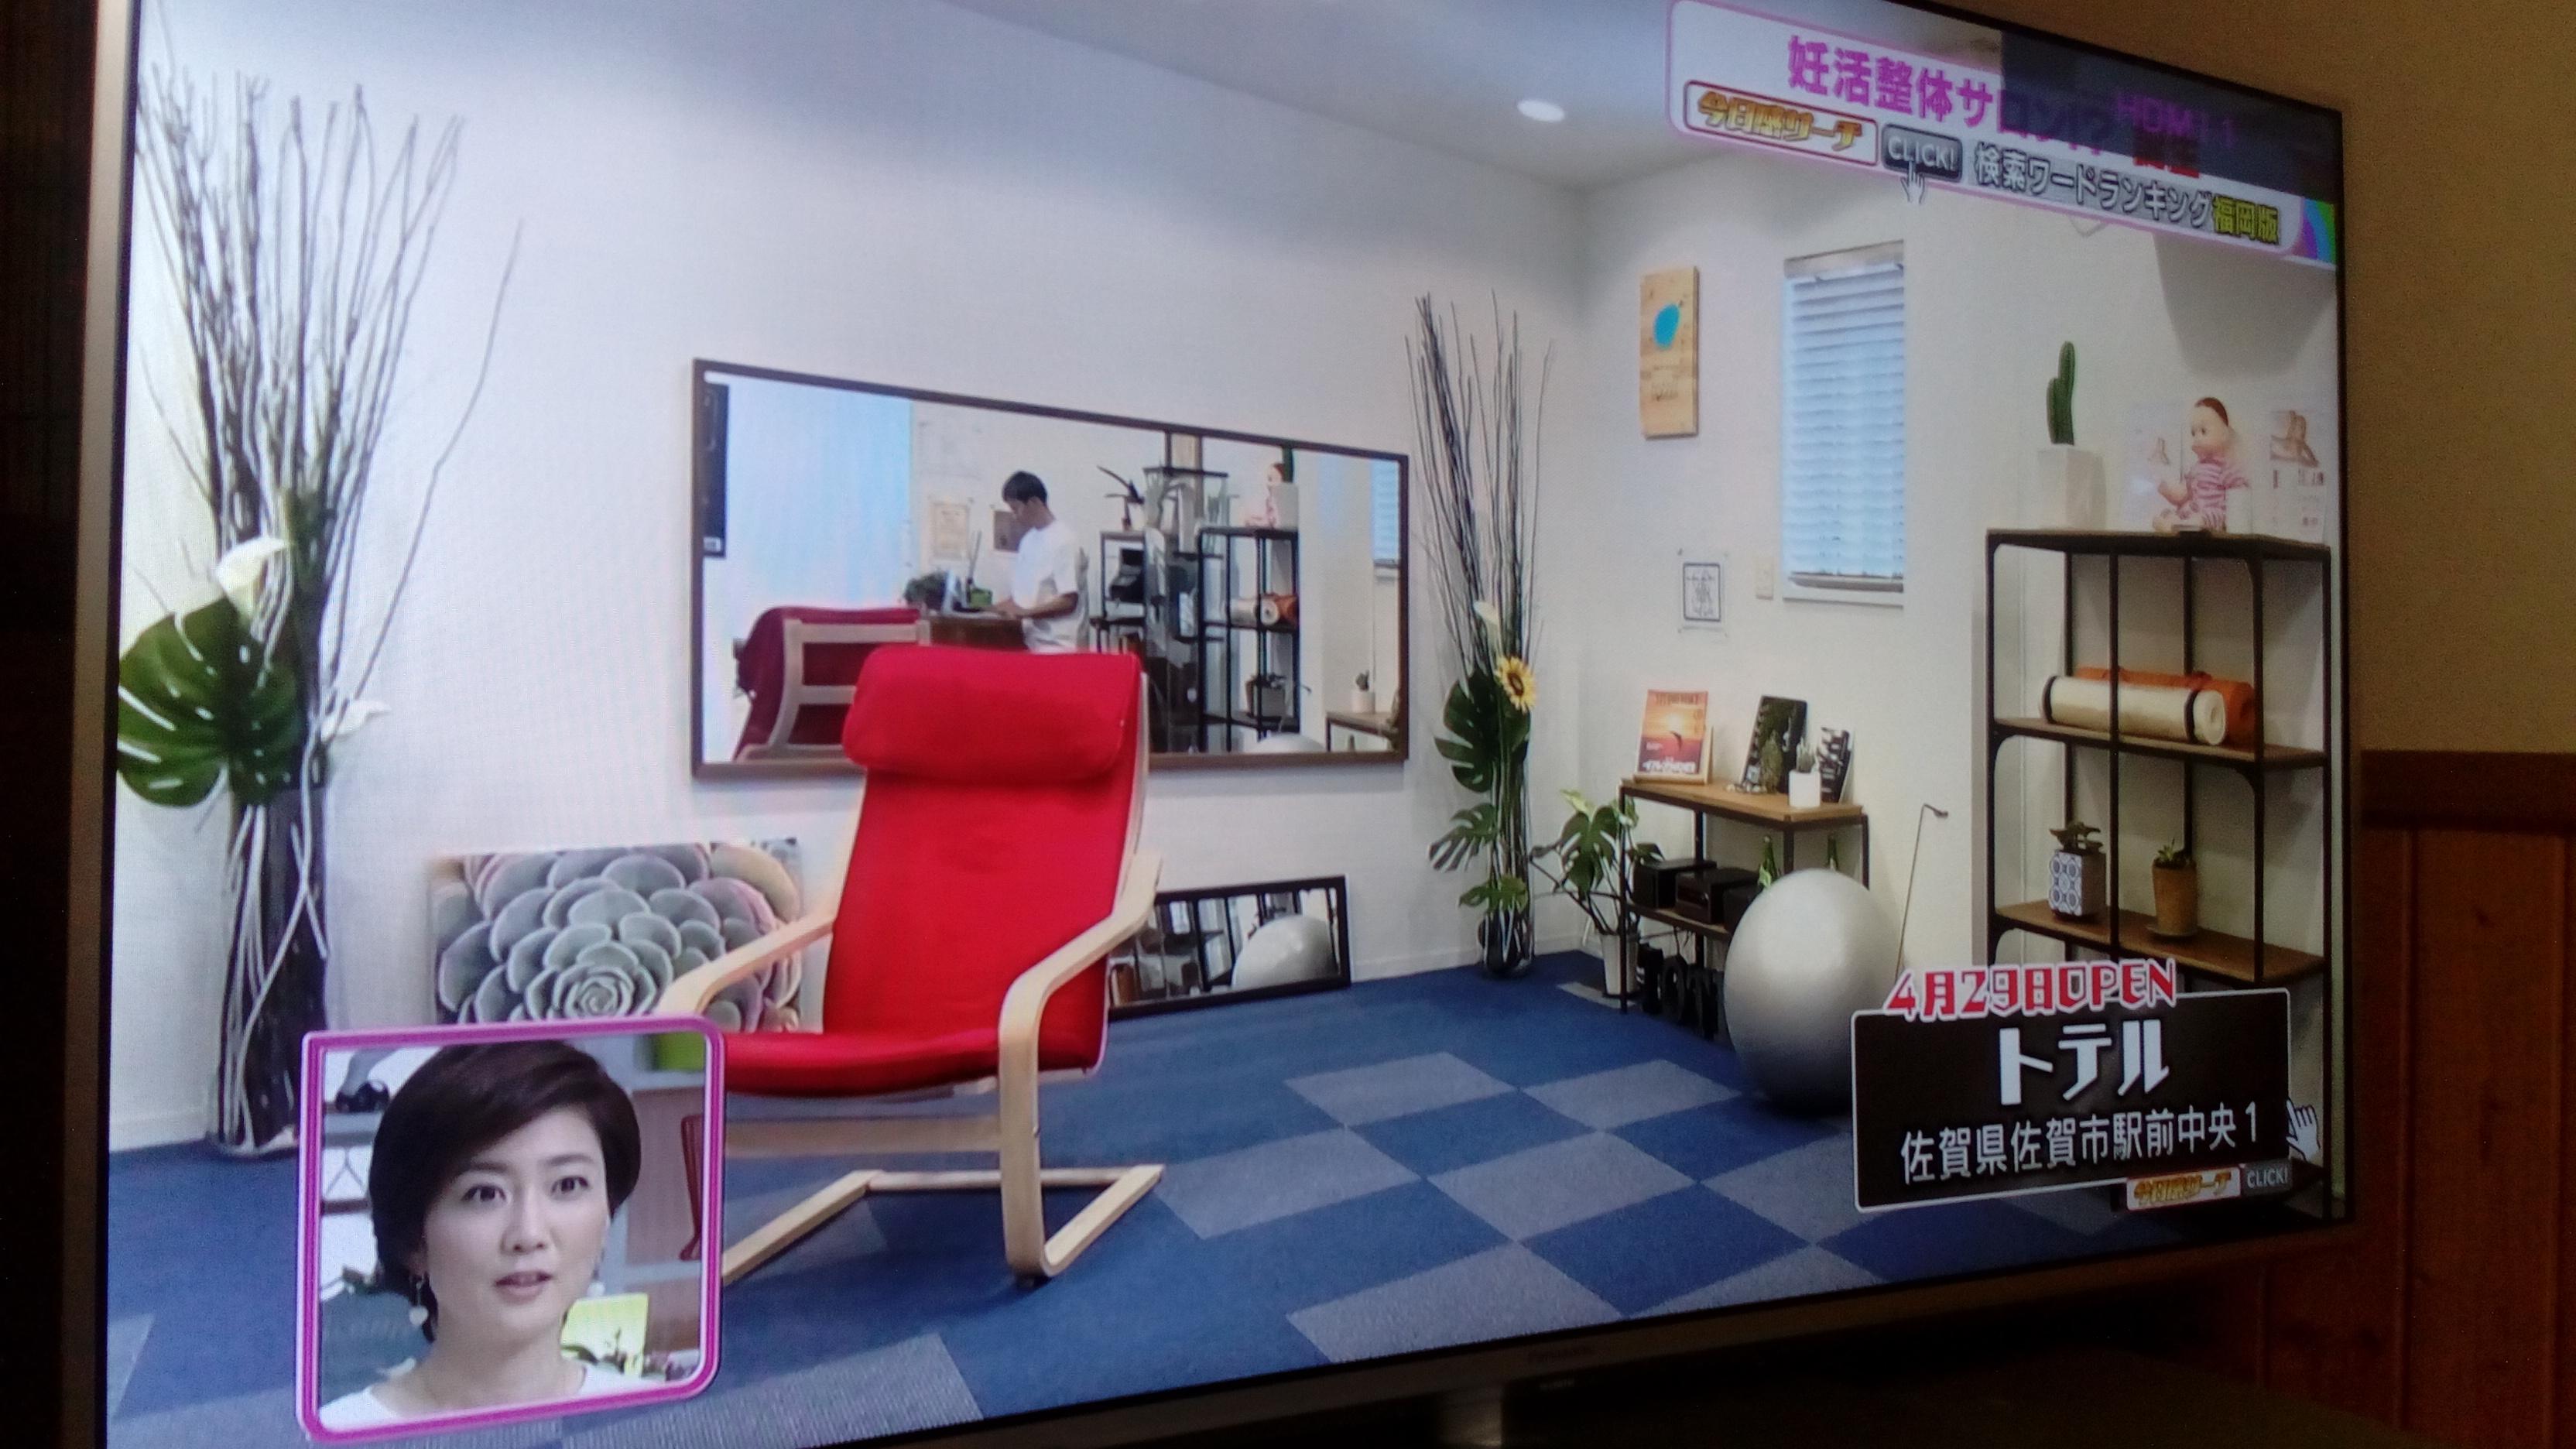 RKB「今日感テレビ」にて 特集で放送して頂きました